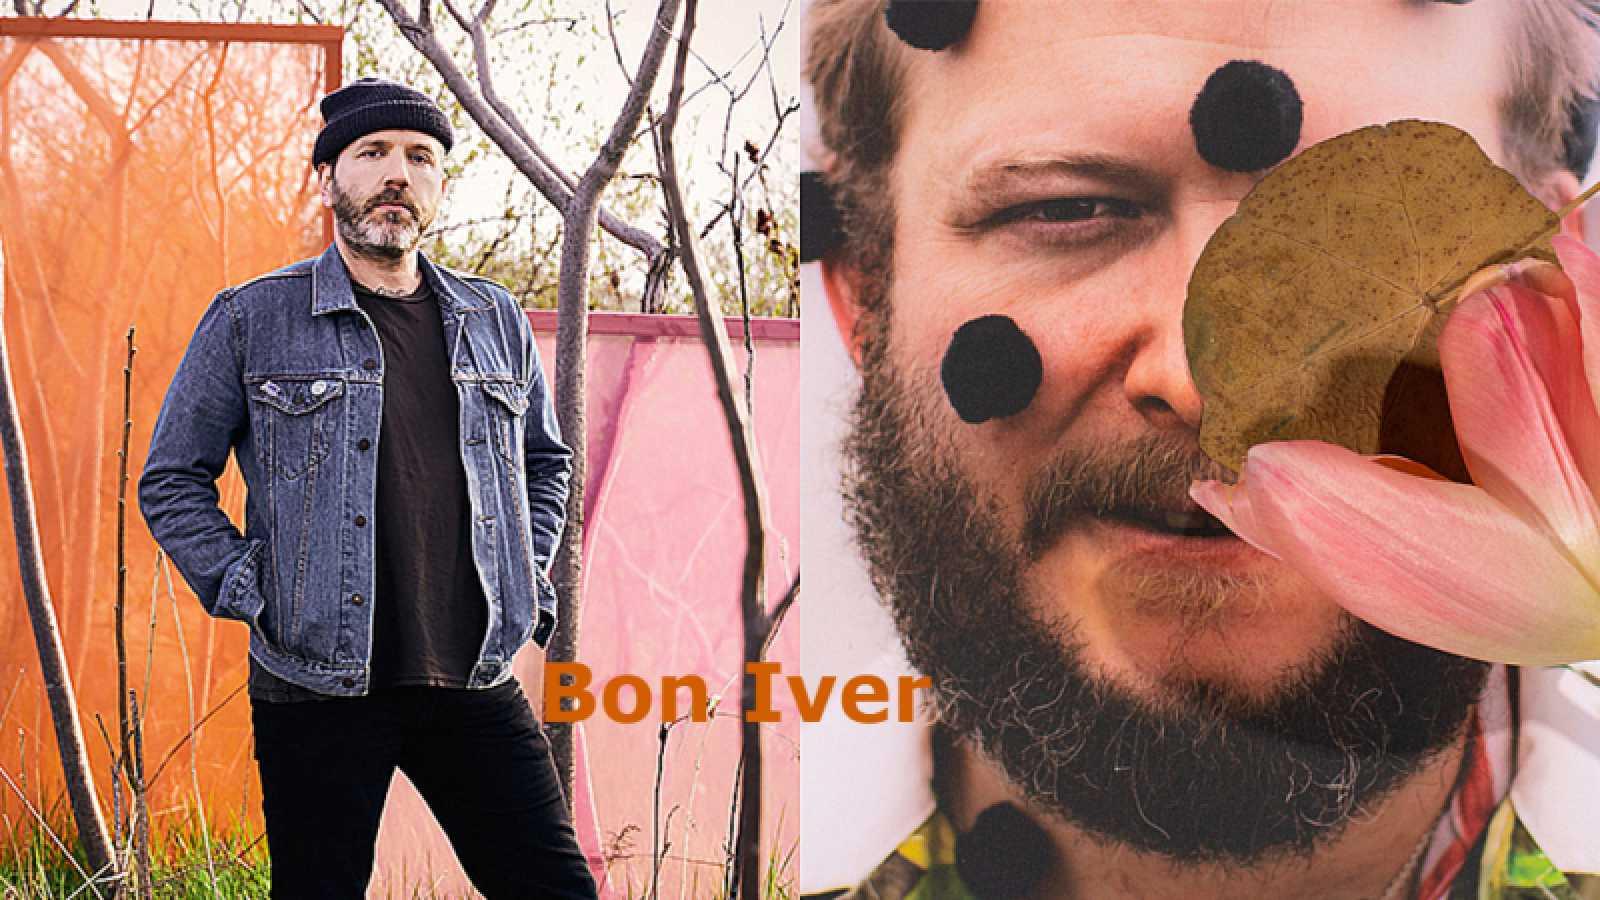 Próxima parada - The Vaccines, The Horrors y Bon Iver - 12/05/21 - escuchar ahora